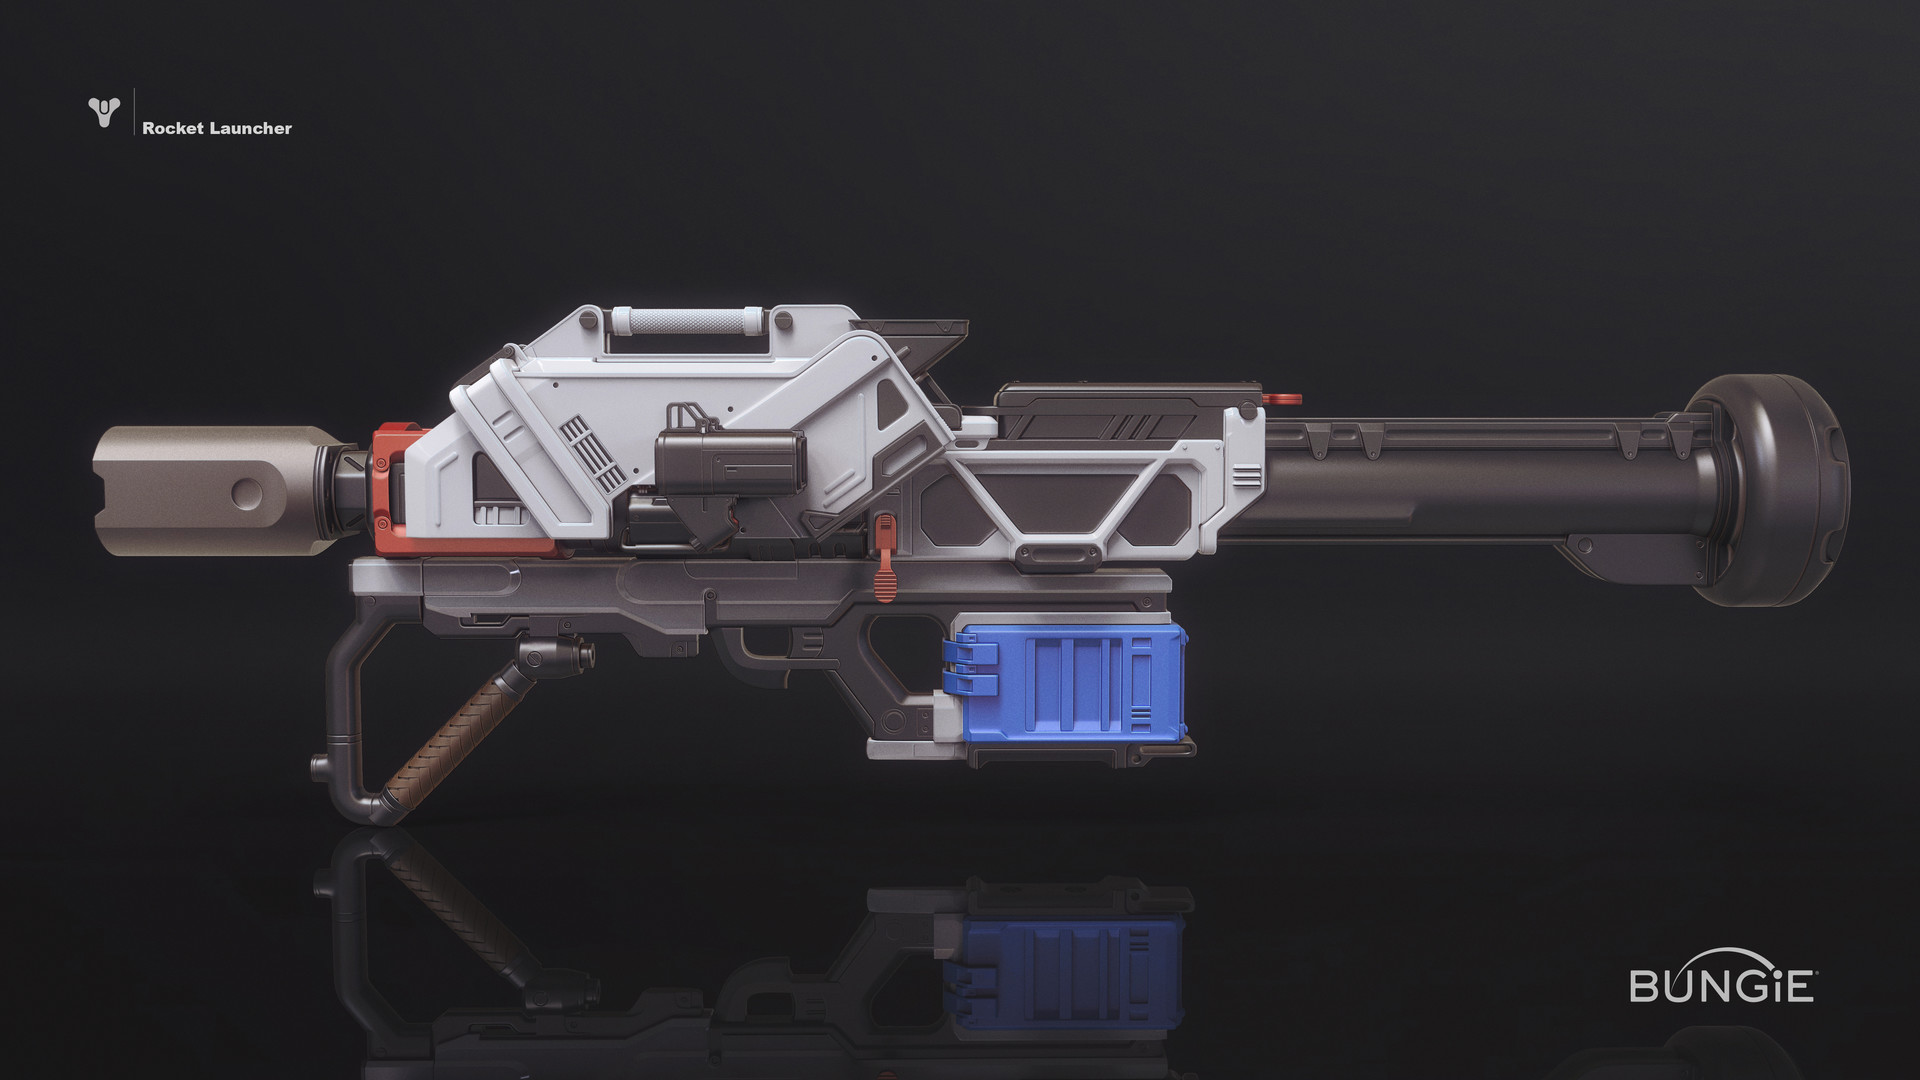 Mark van haitsma d1 rocket launcher 1e